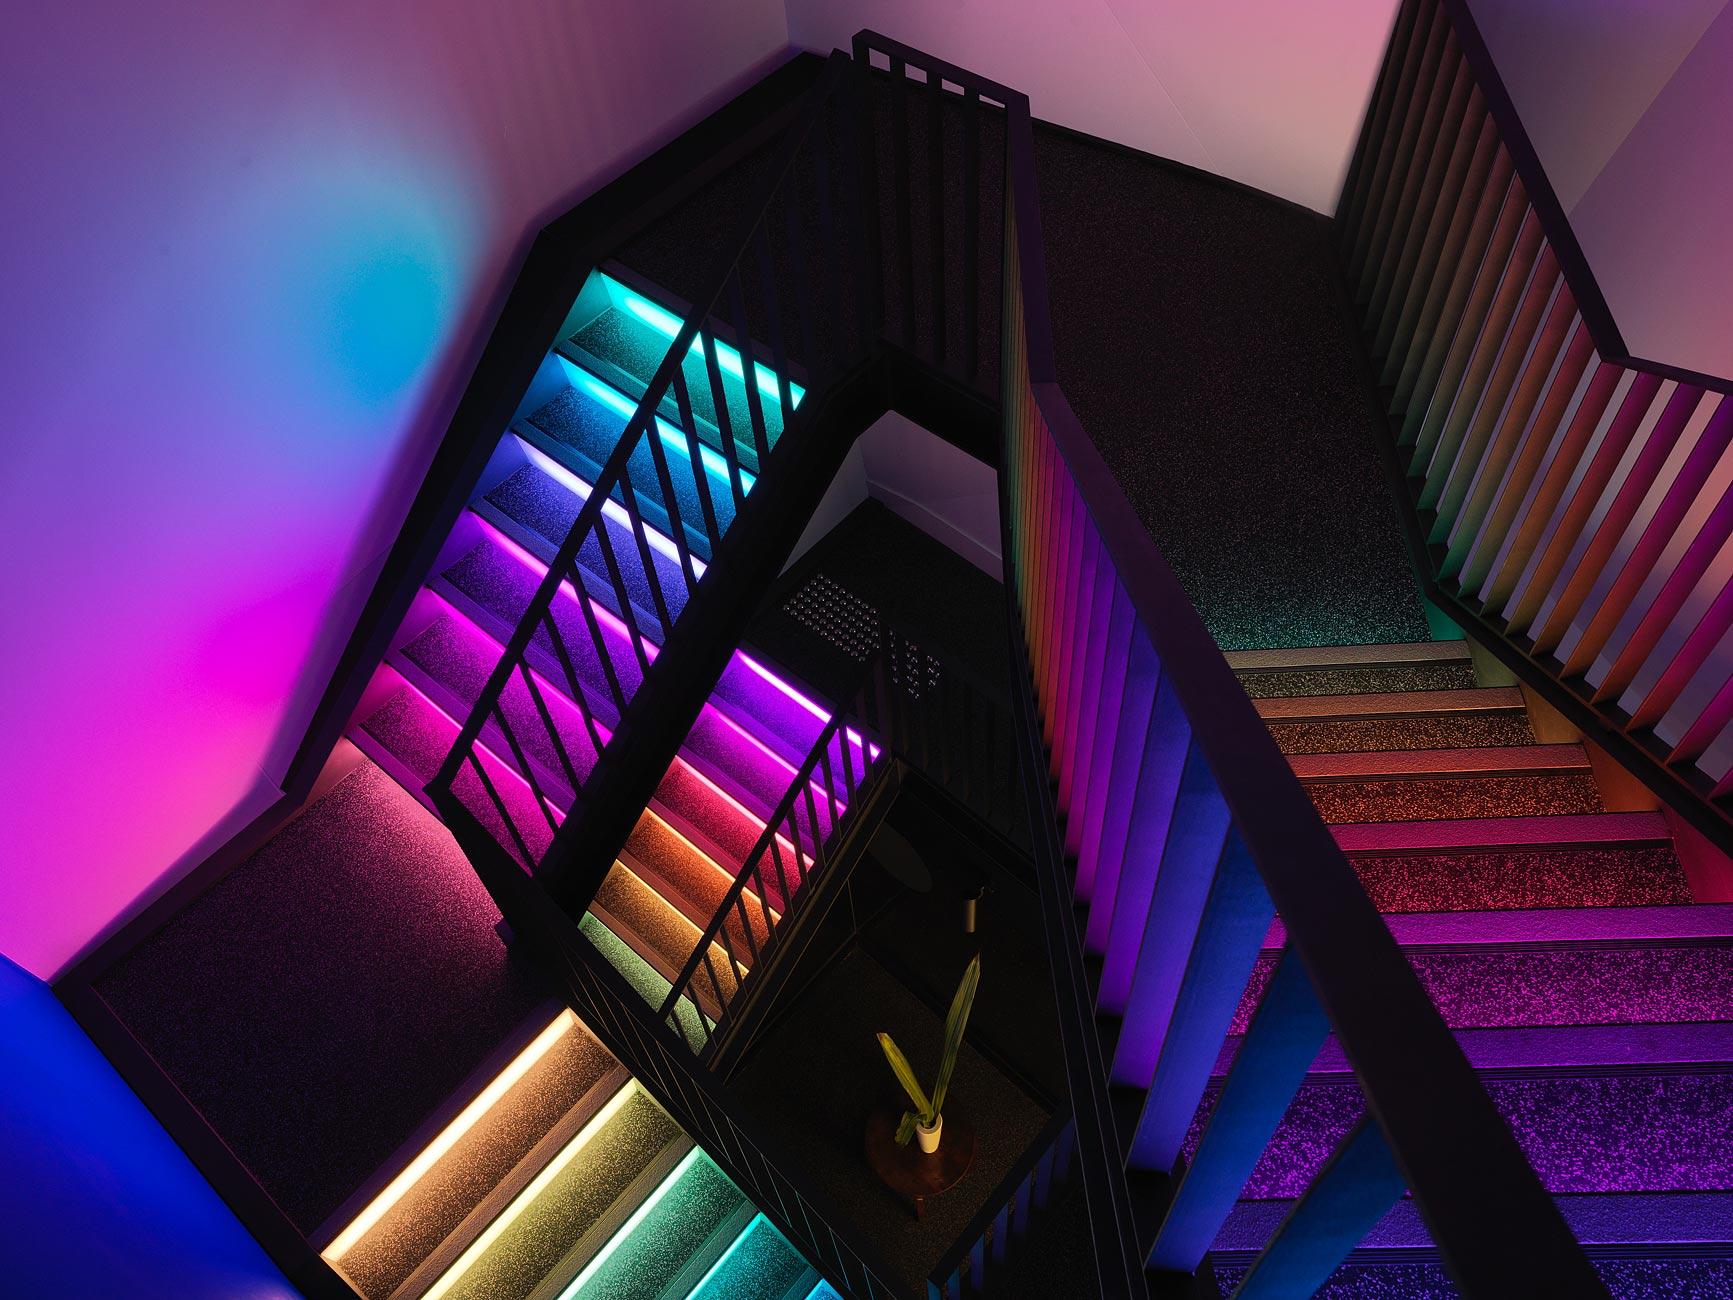 justin-house-museum-1.jpg